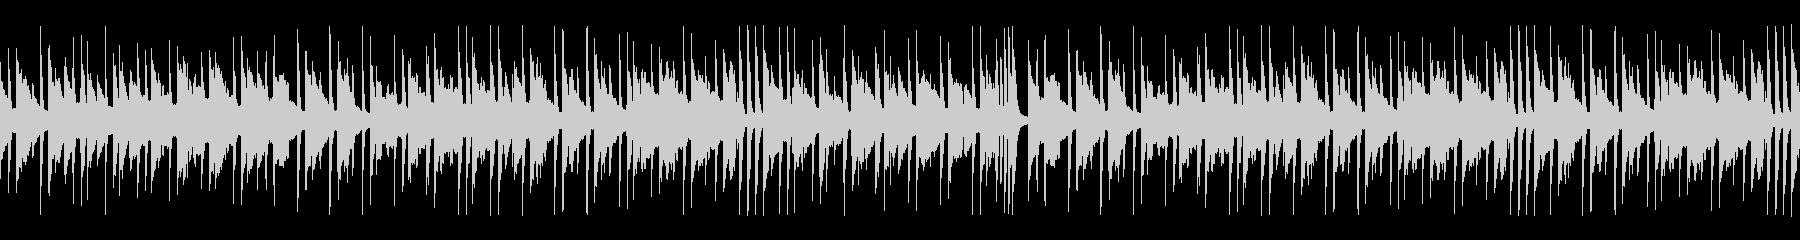 BGM008-02 トランプのカードゲ…の未再生の波形